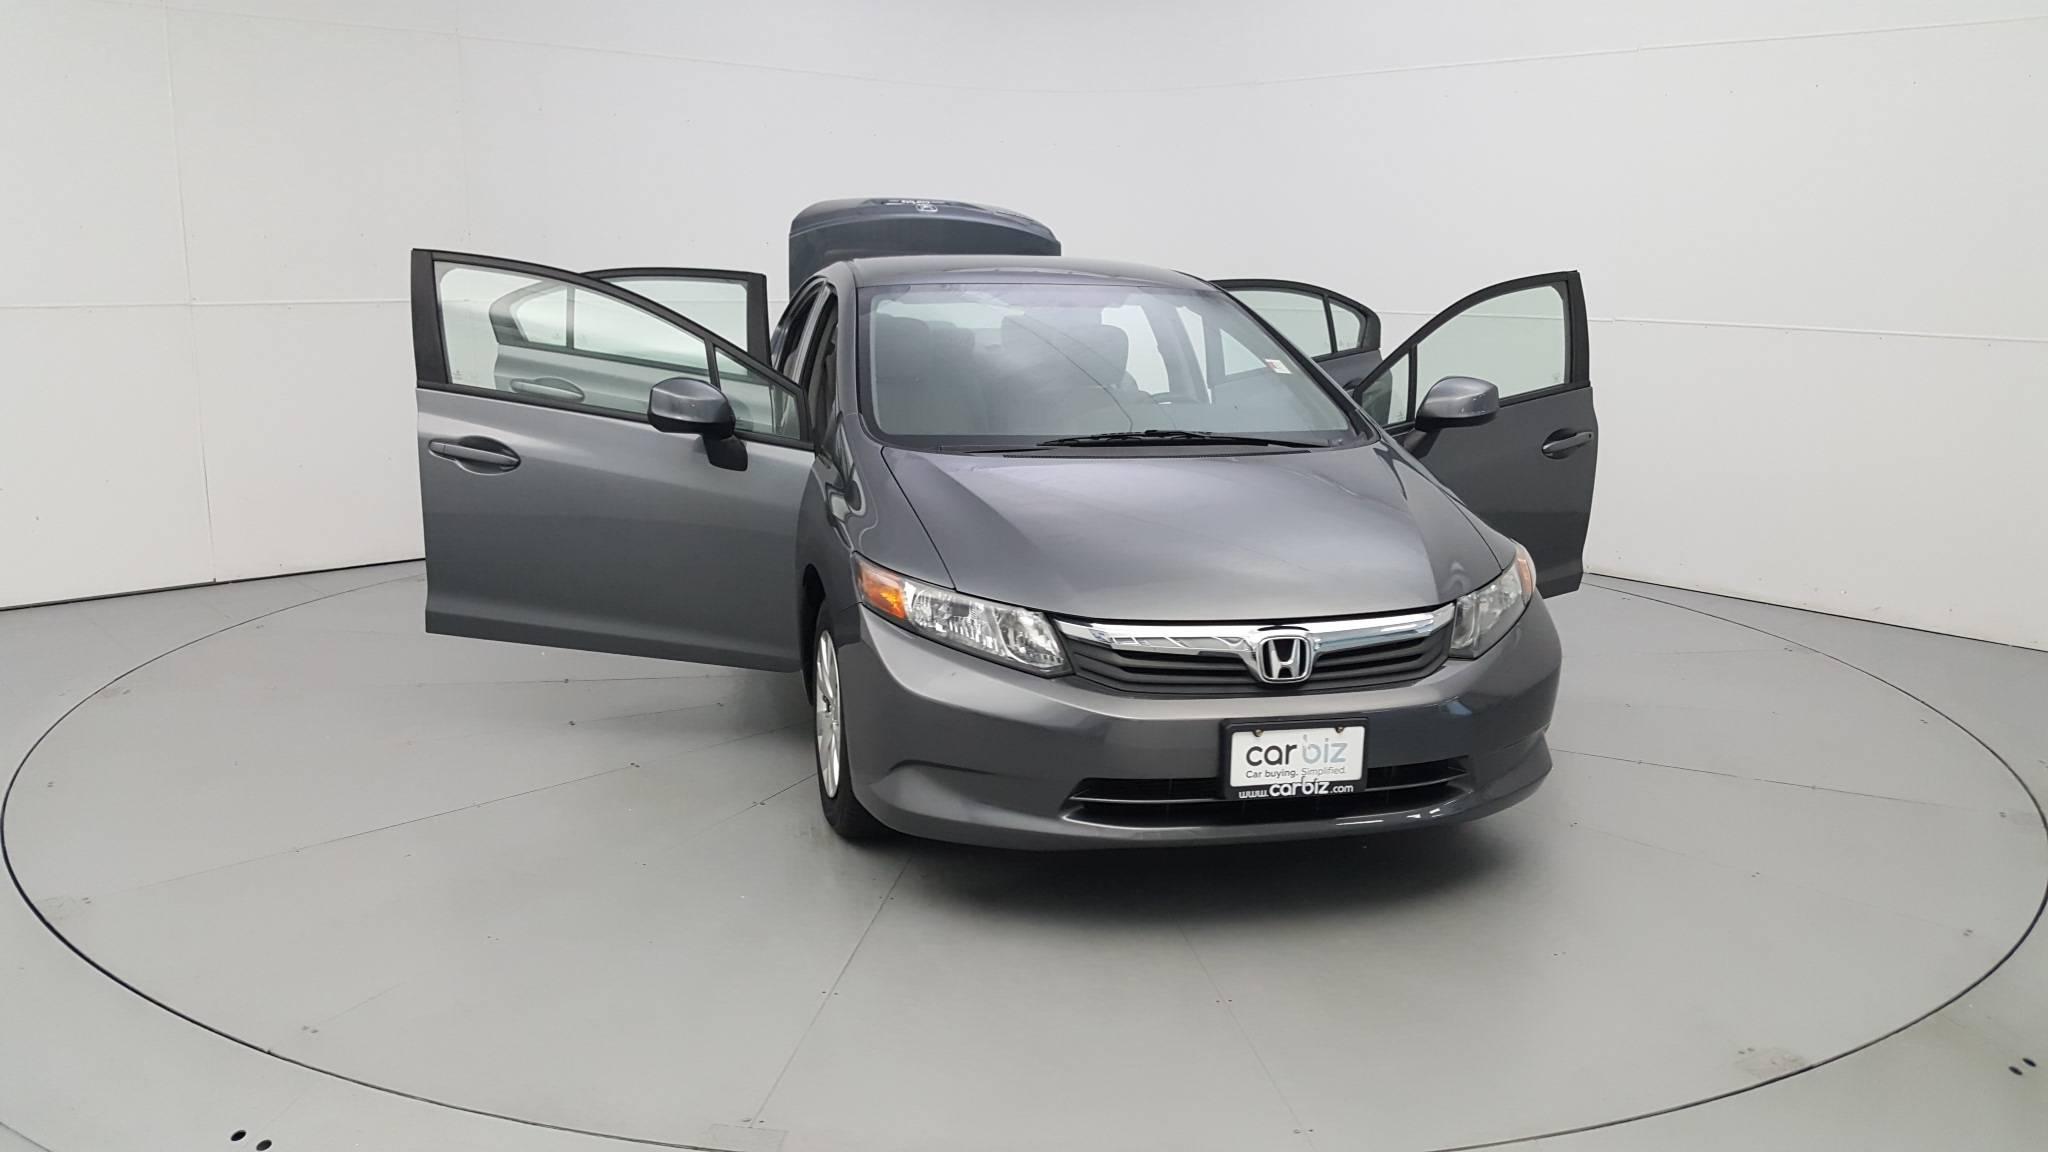 Pre-Owned 2012 Honda Civic LX